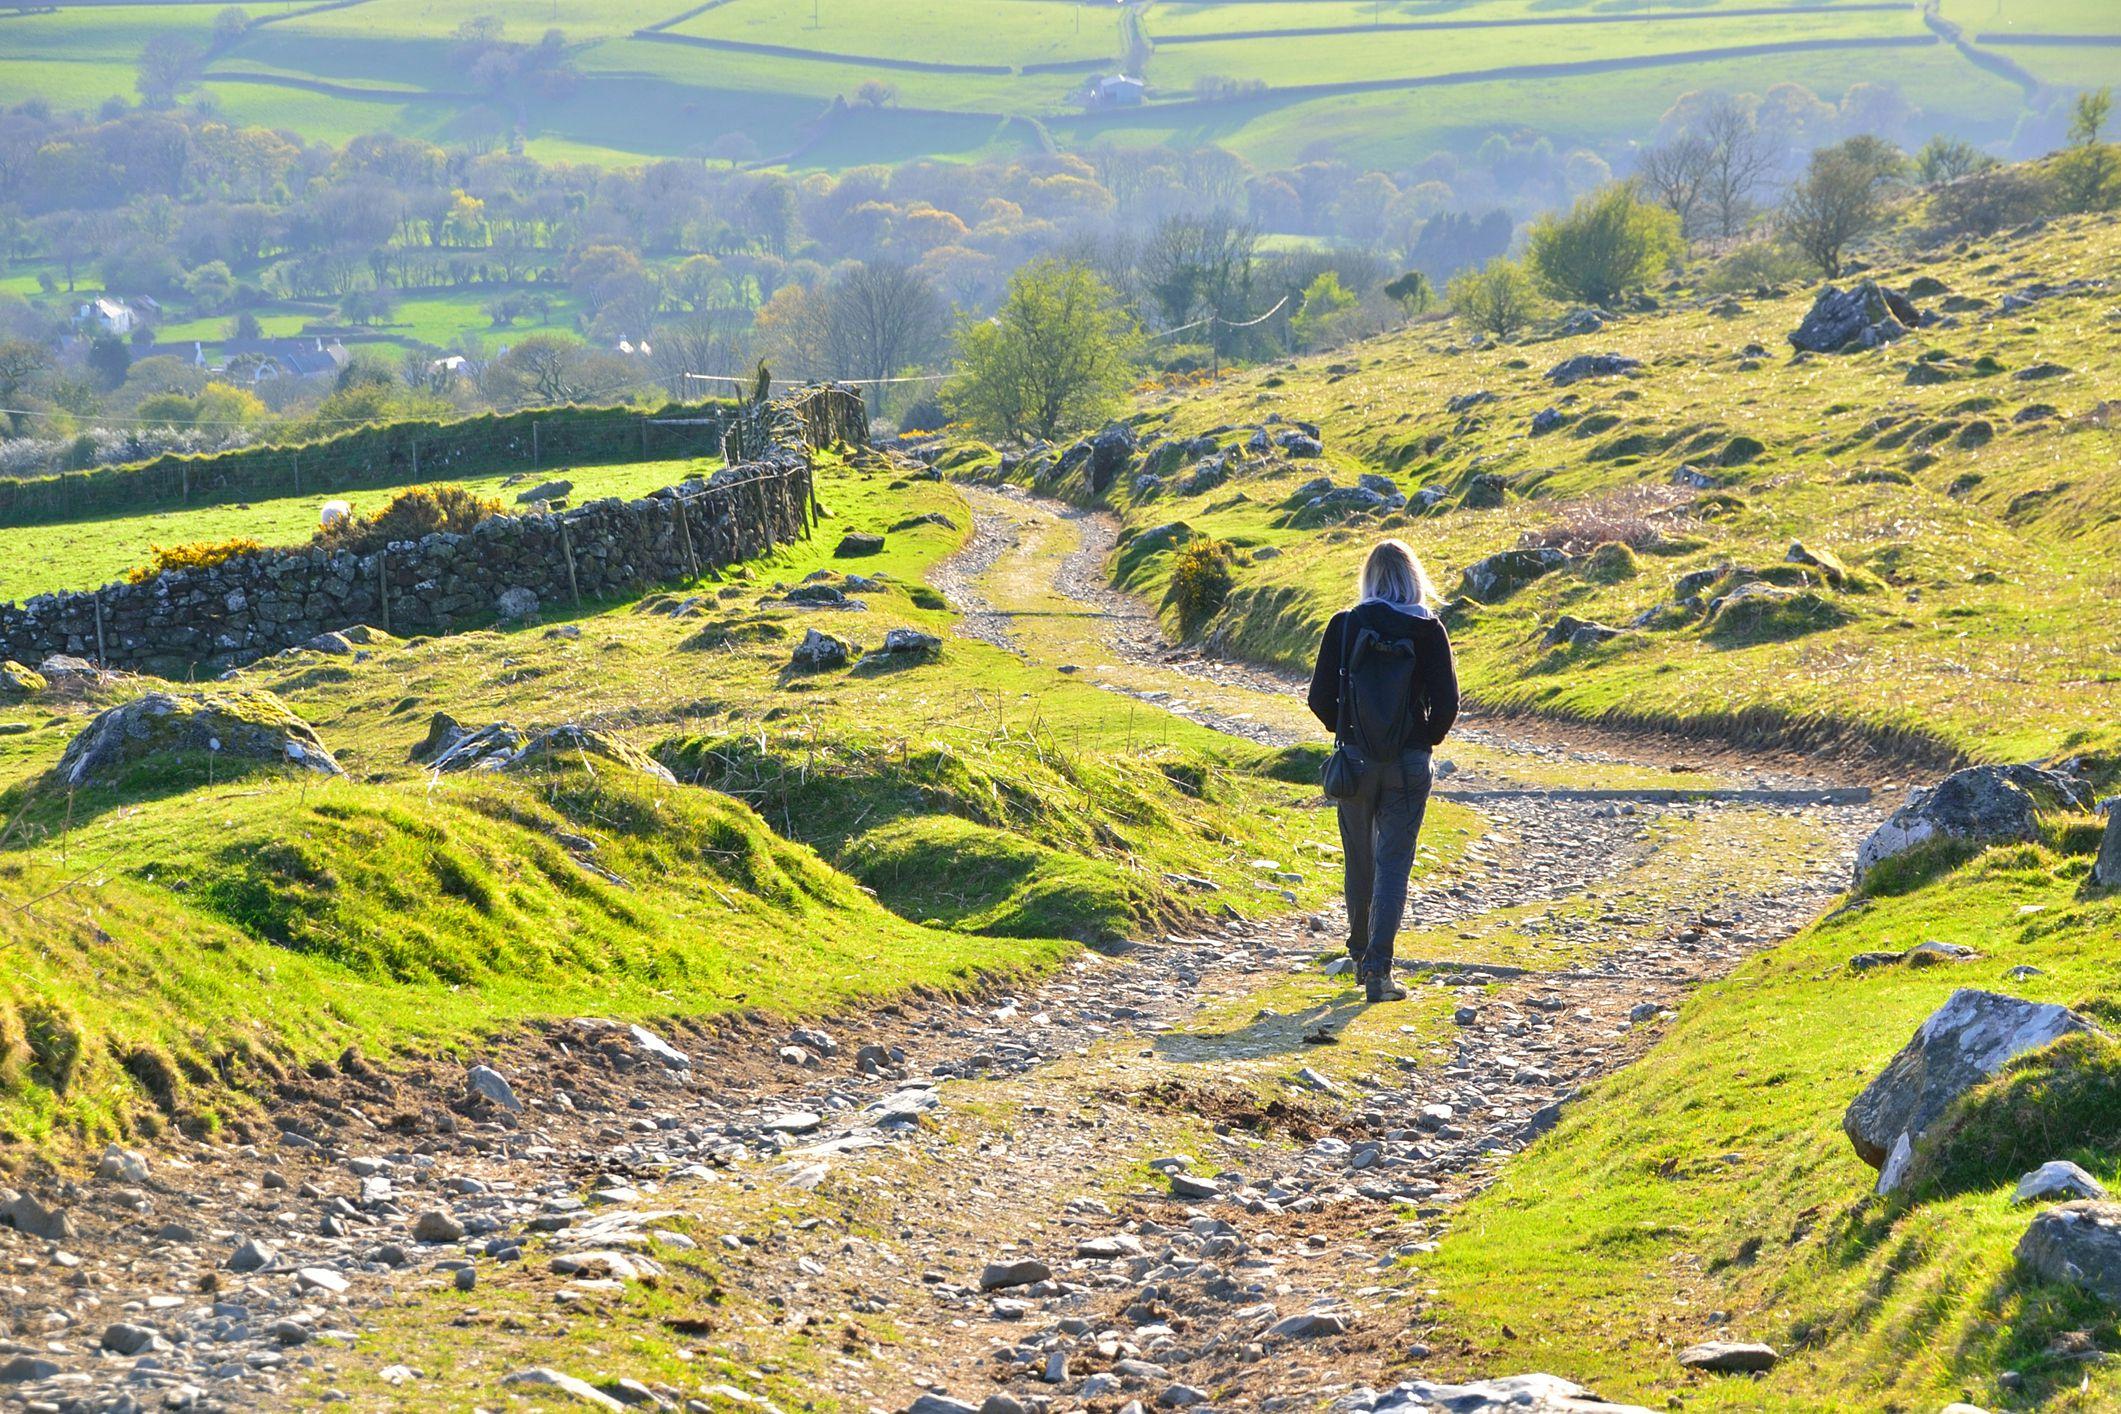 A woman walks around the barren moorland alone in Dartmoor National Park, Devon England UK